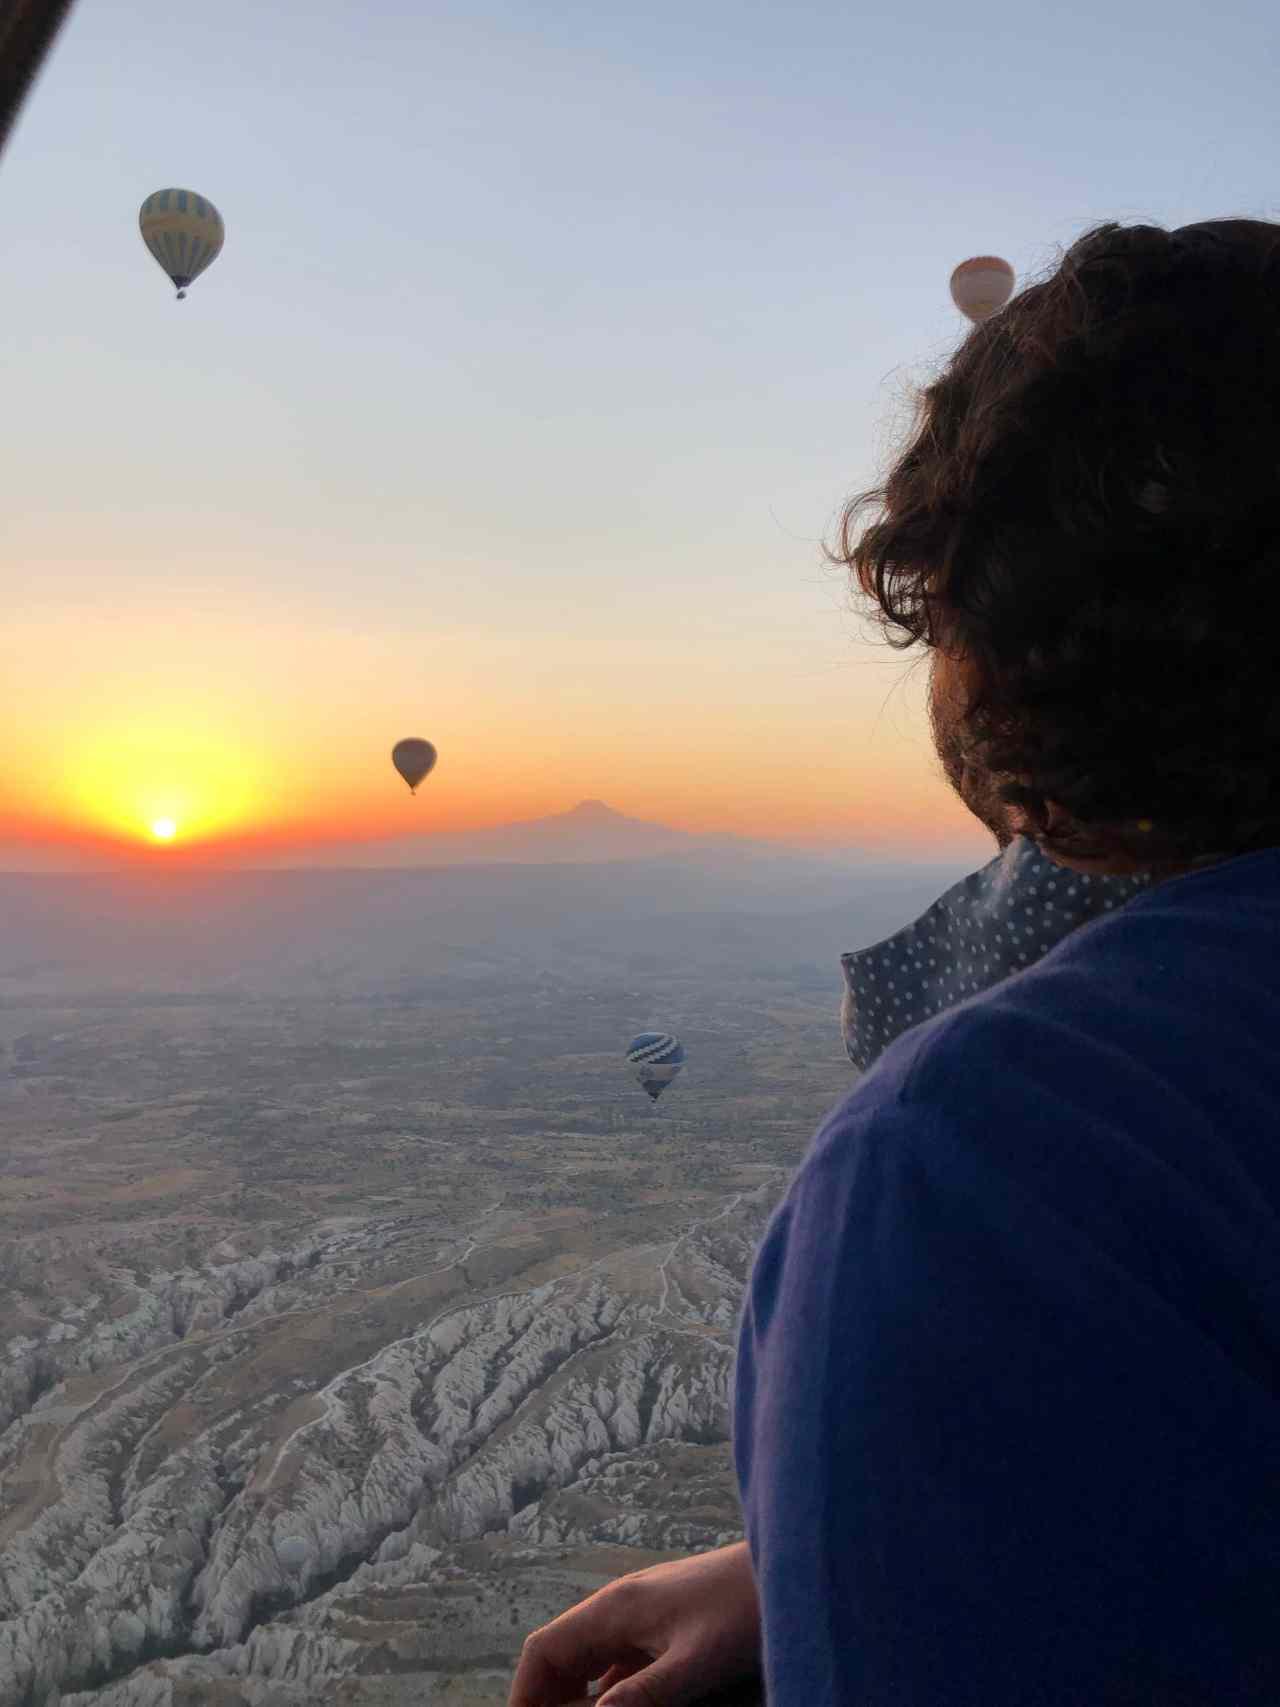 View from hot air balloon Cappadocia